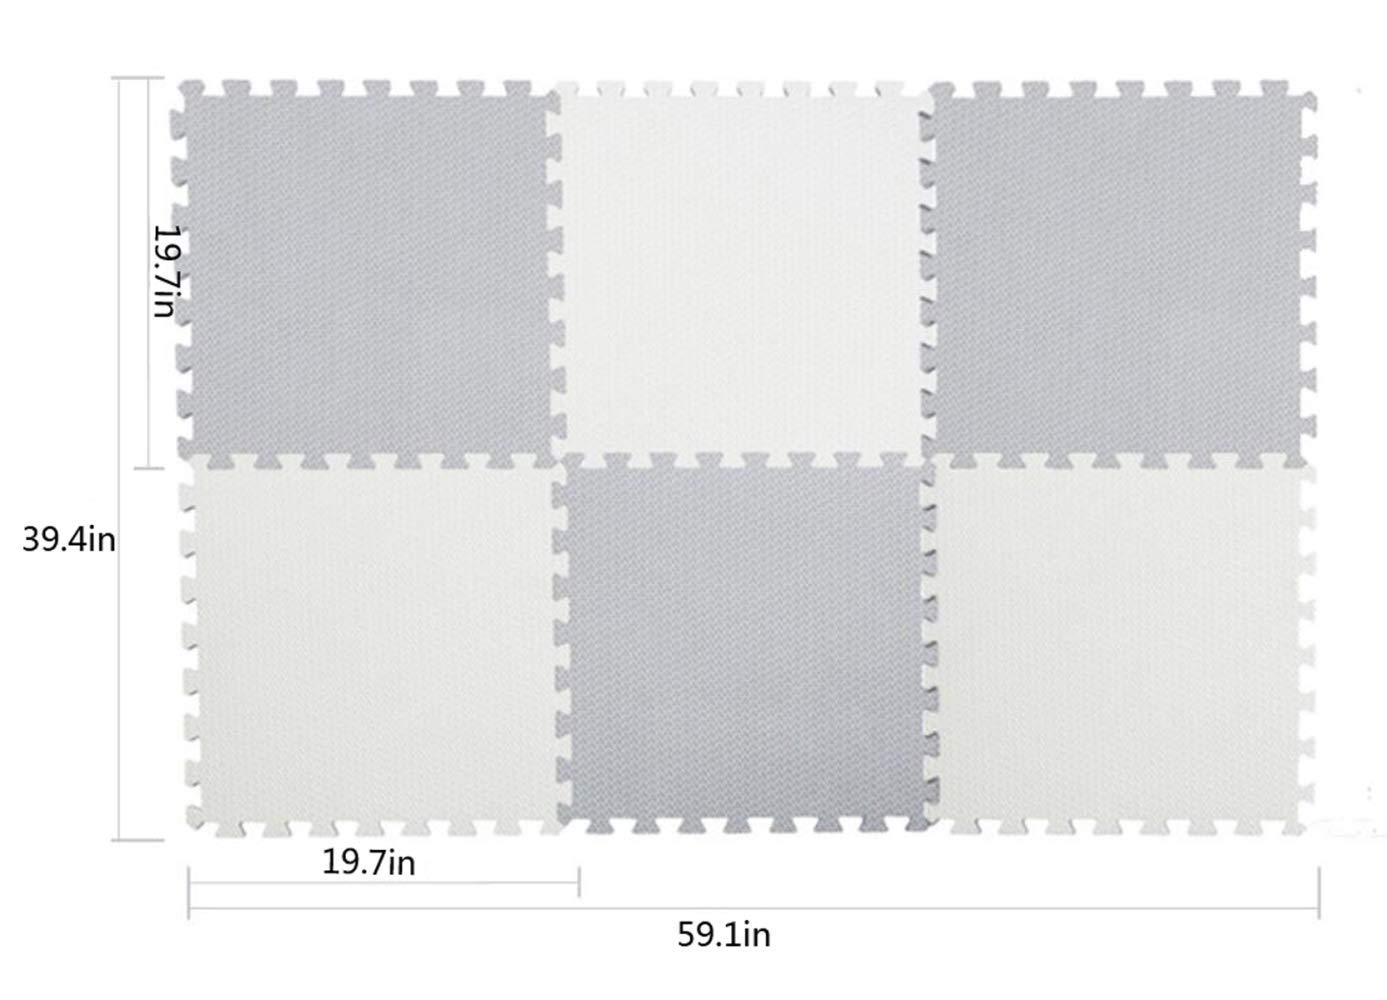 QXMEI Stitching High Elastic Foam Pad Puzzle Mat Children's Mat Crawling Mat Baby Bedroom Slip,Beige+Gray by QXMEI (Image #1)